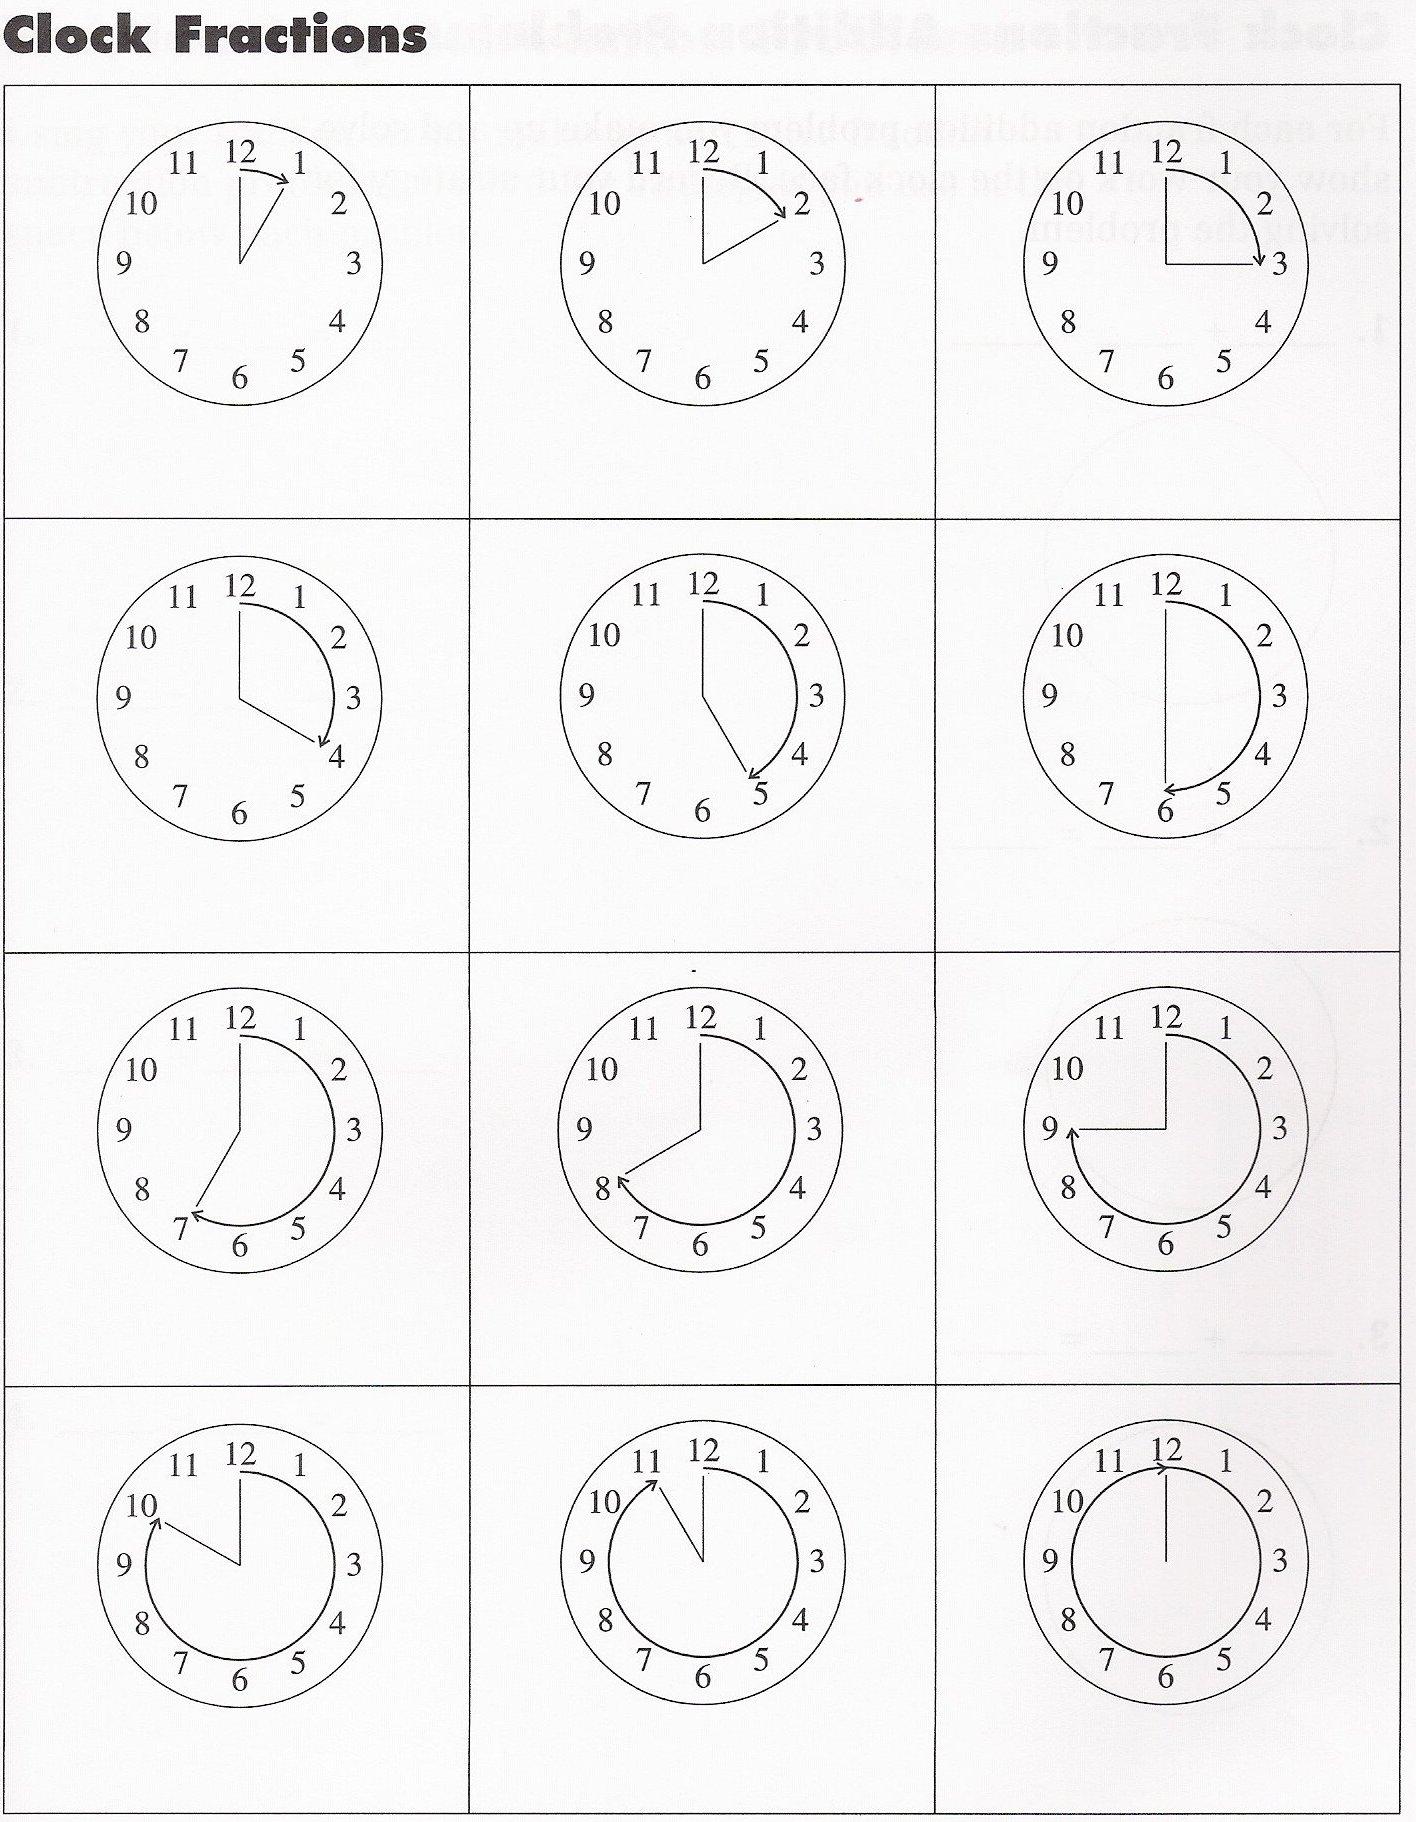 Clock Fractions Worksheet  2345483